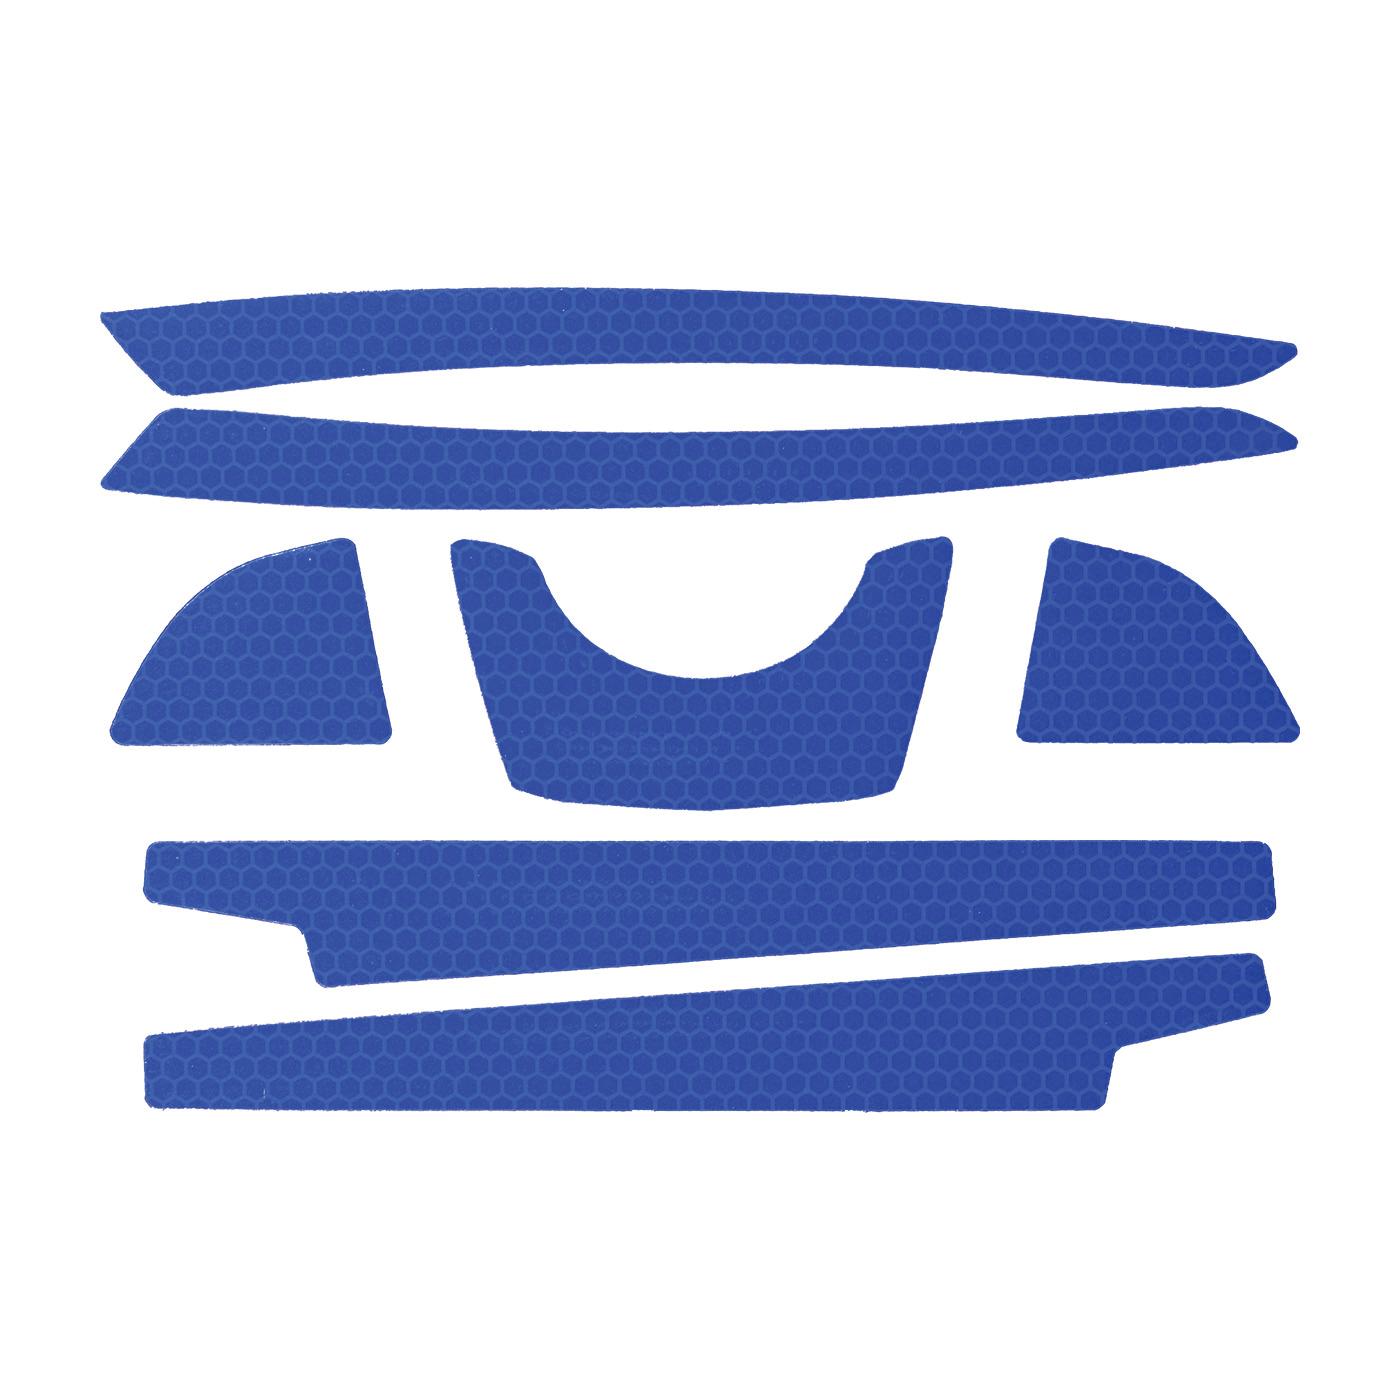 JSP® 281-CR2FB-10-BL Reflective Kit, Blue